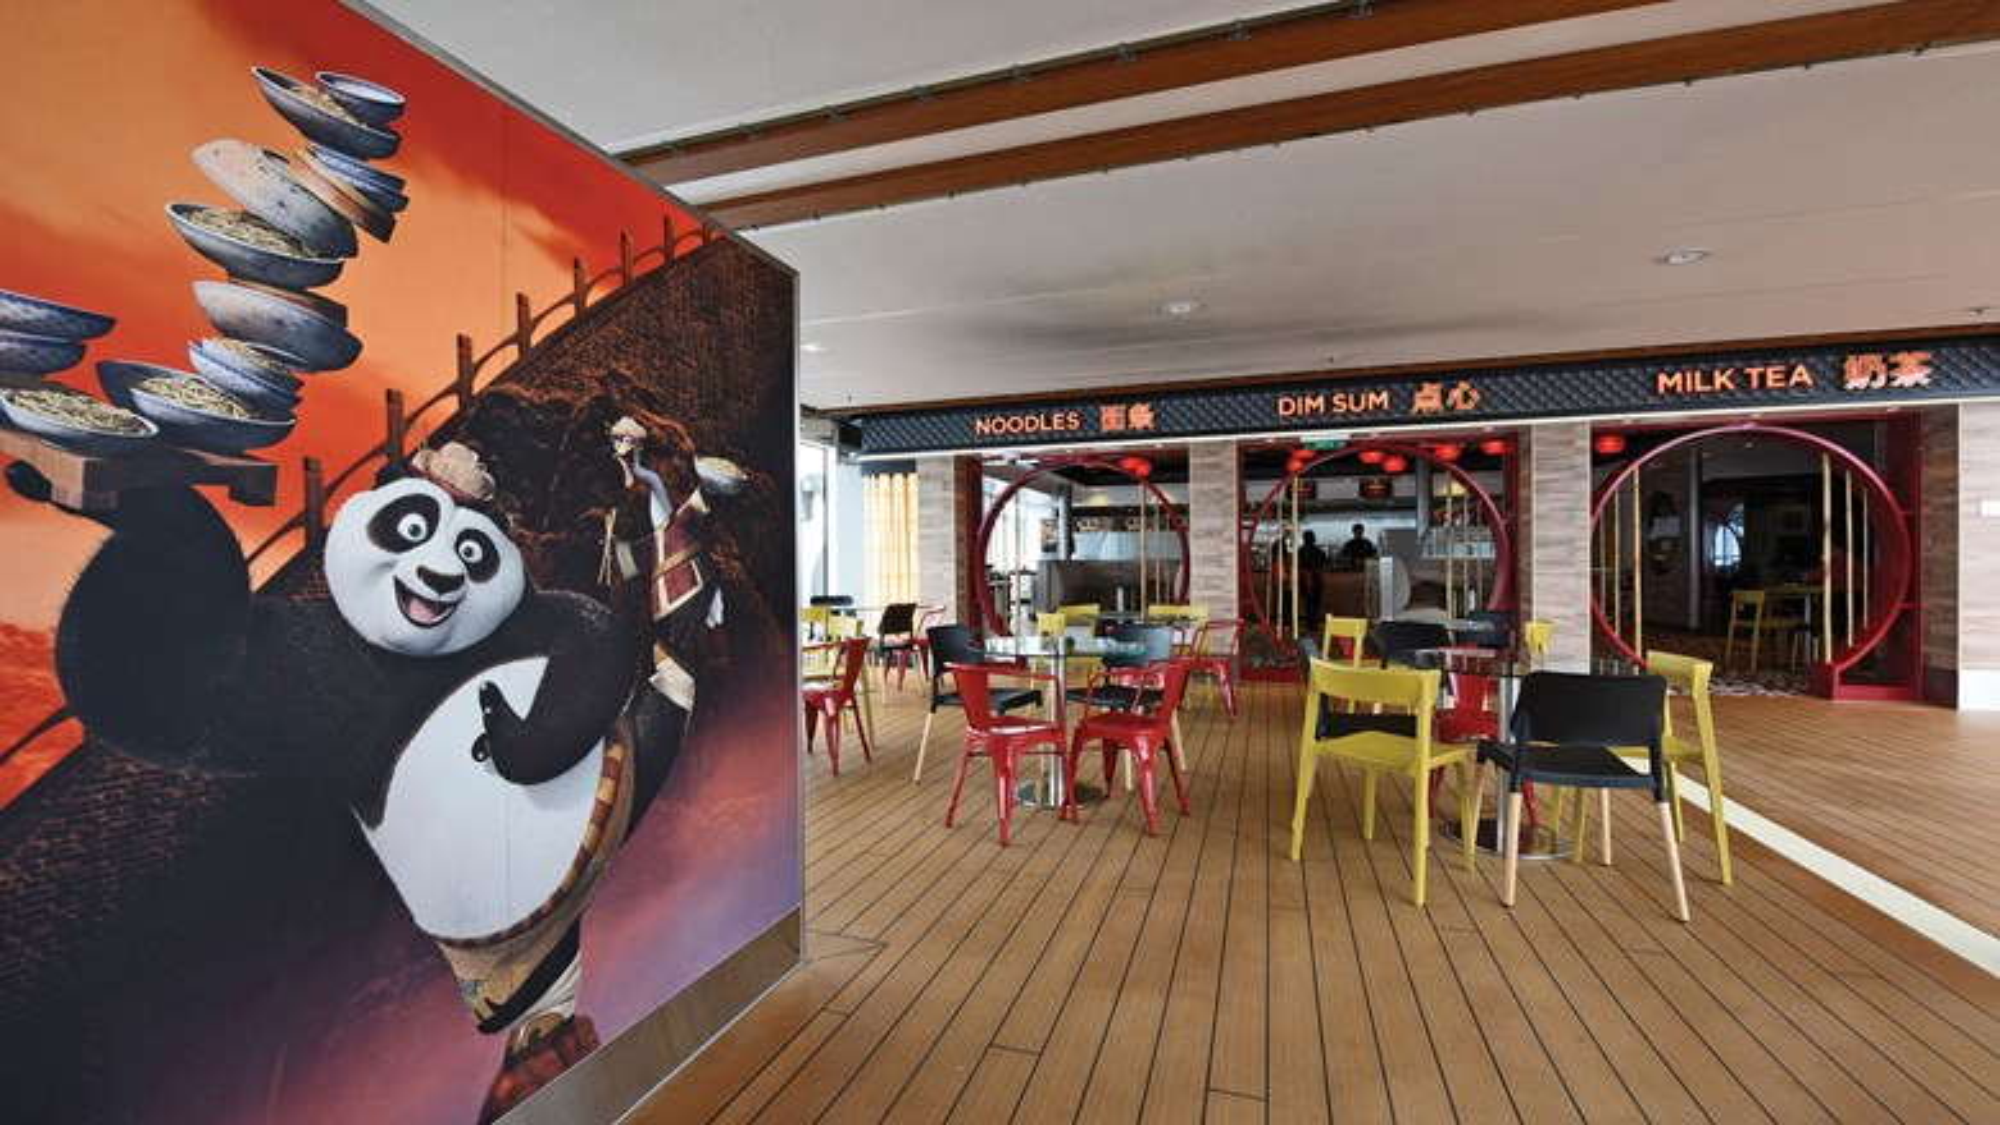 Goodbye, Shrek: Royal Caribbean parts ways with DreamWorks